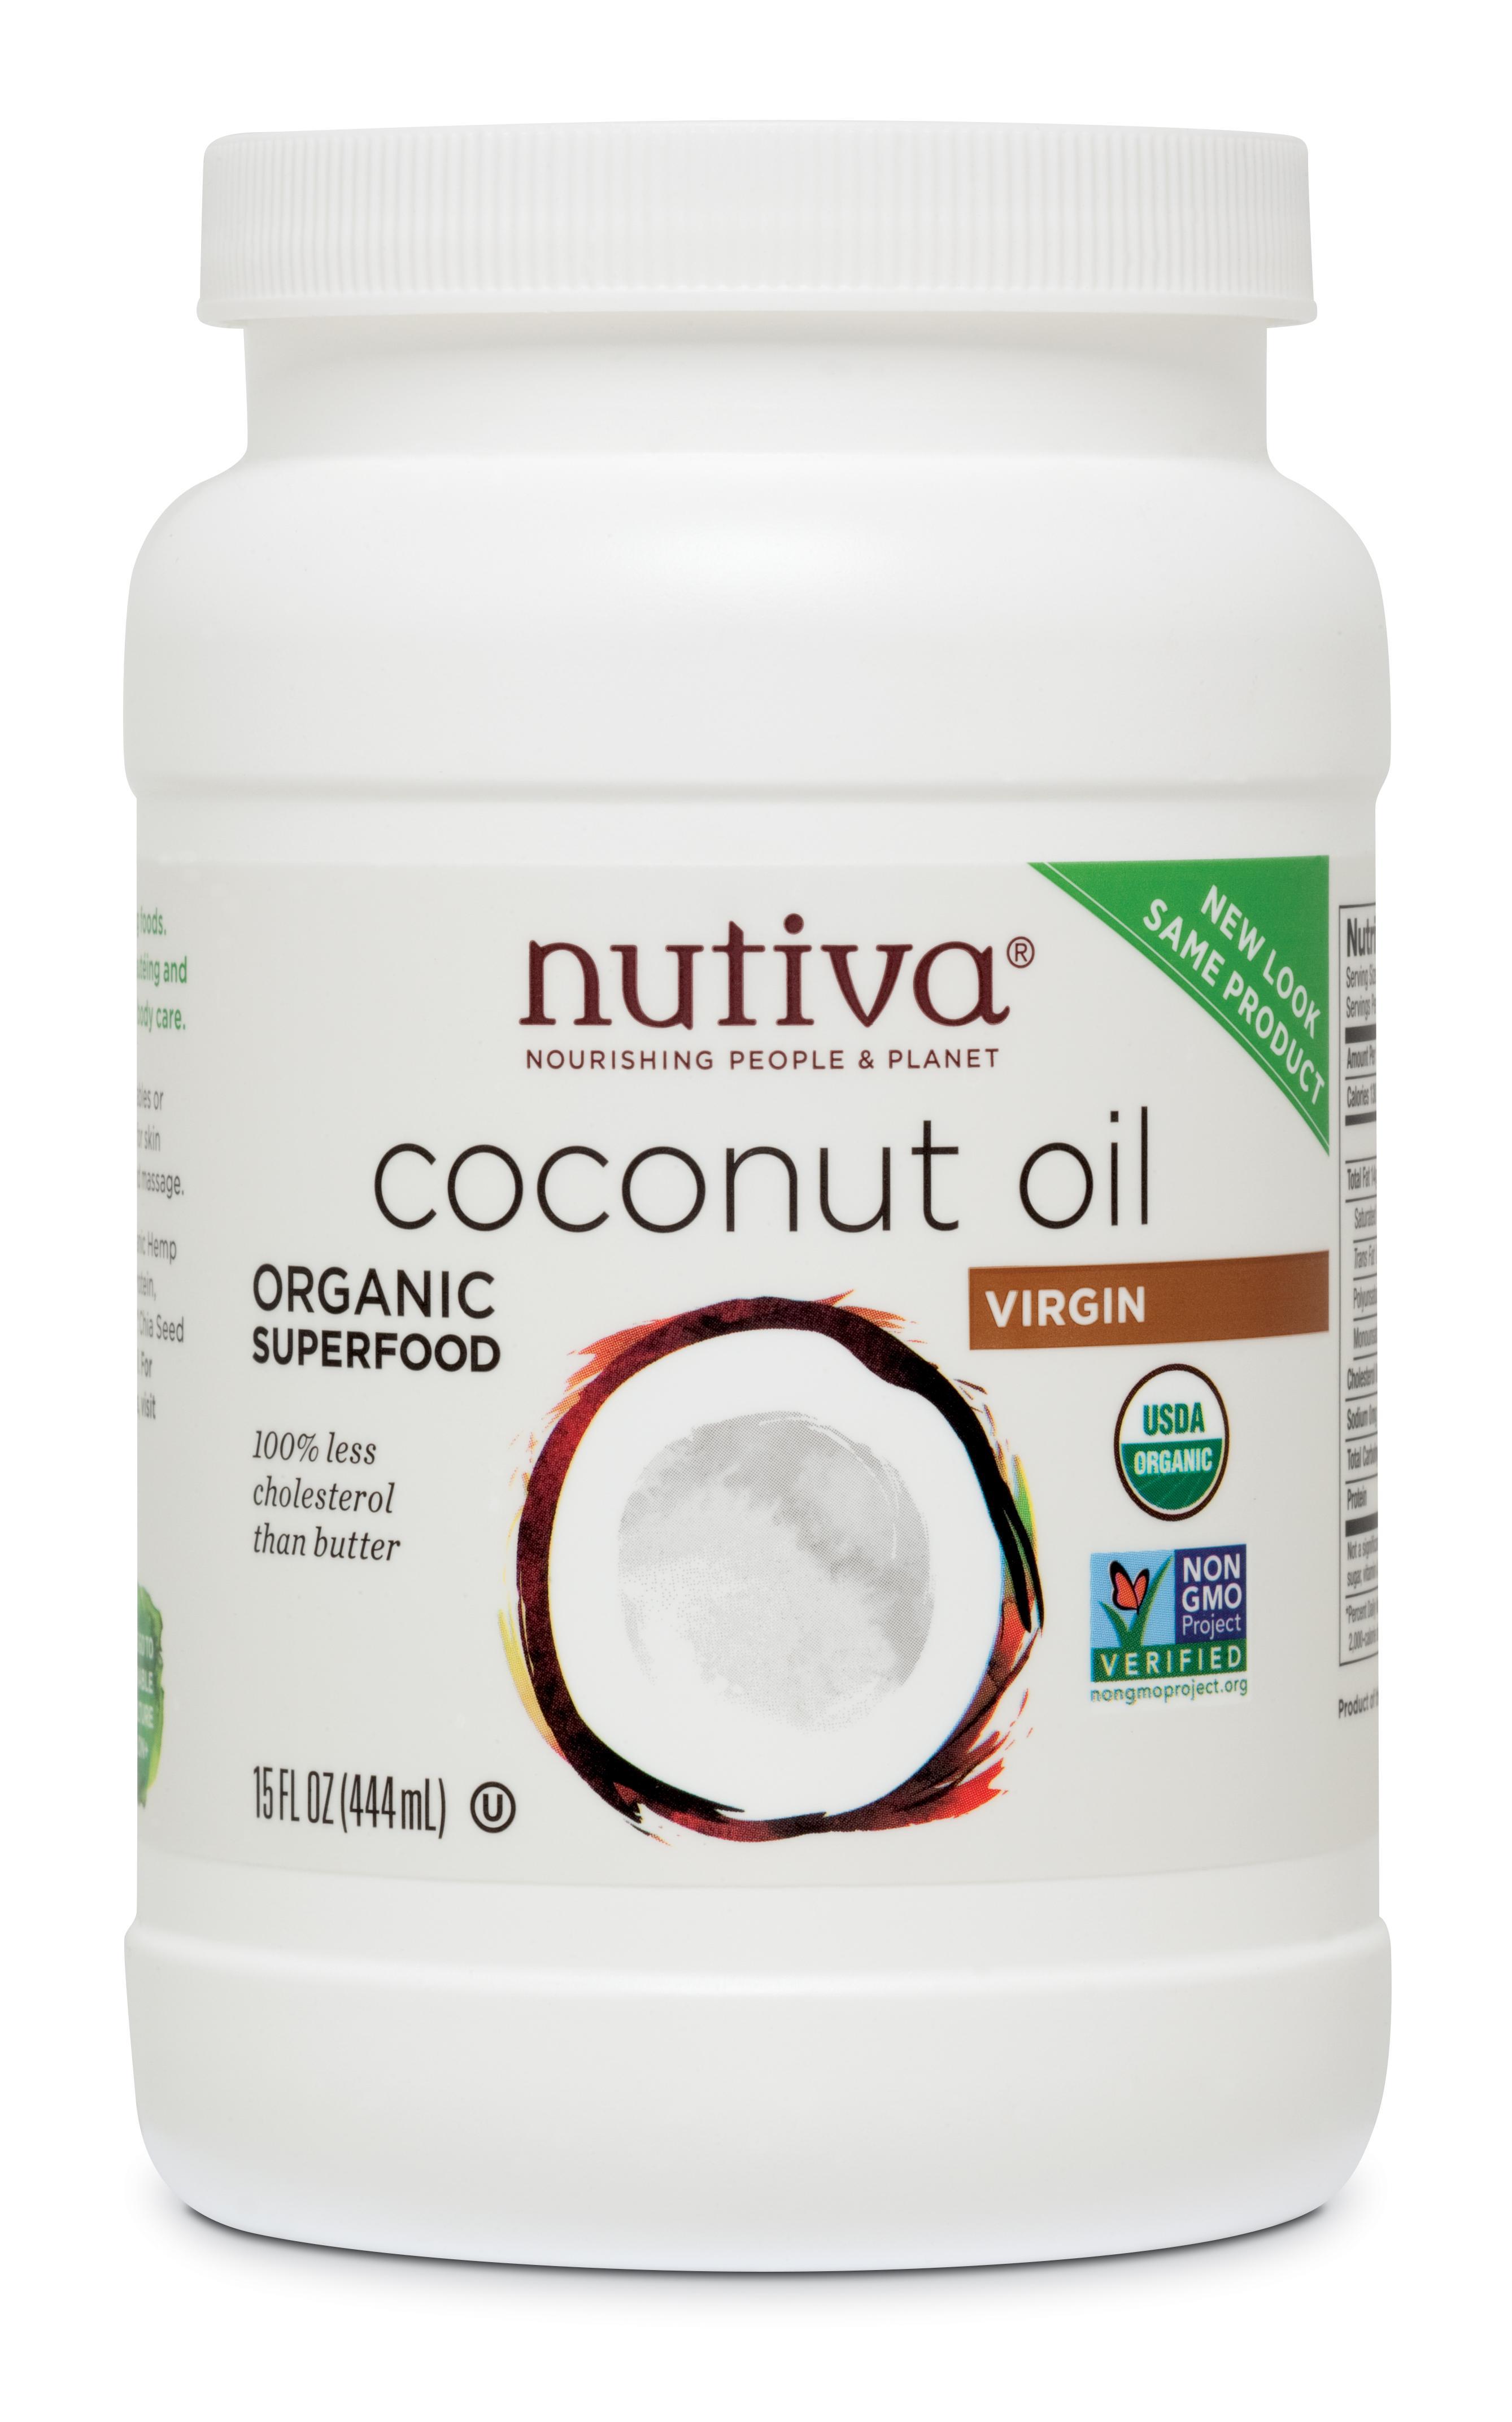 Business analysis of virgin coconut oil